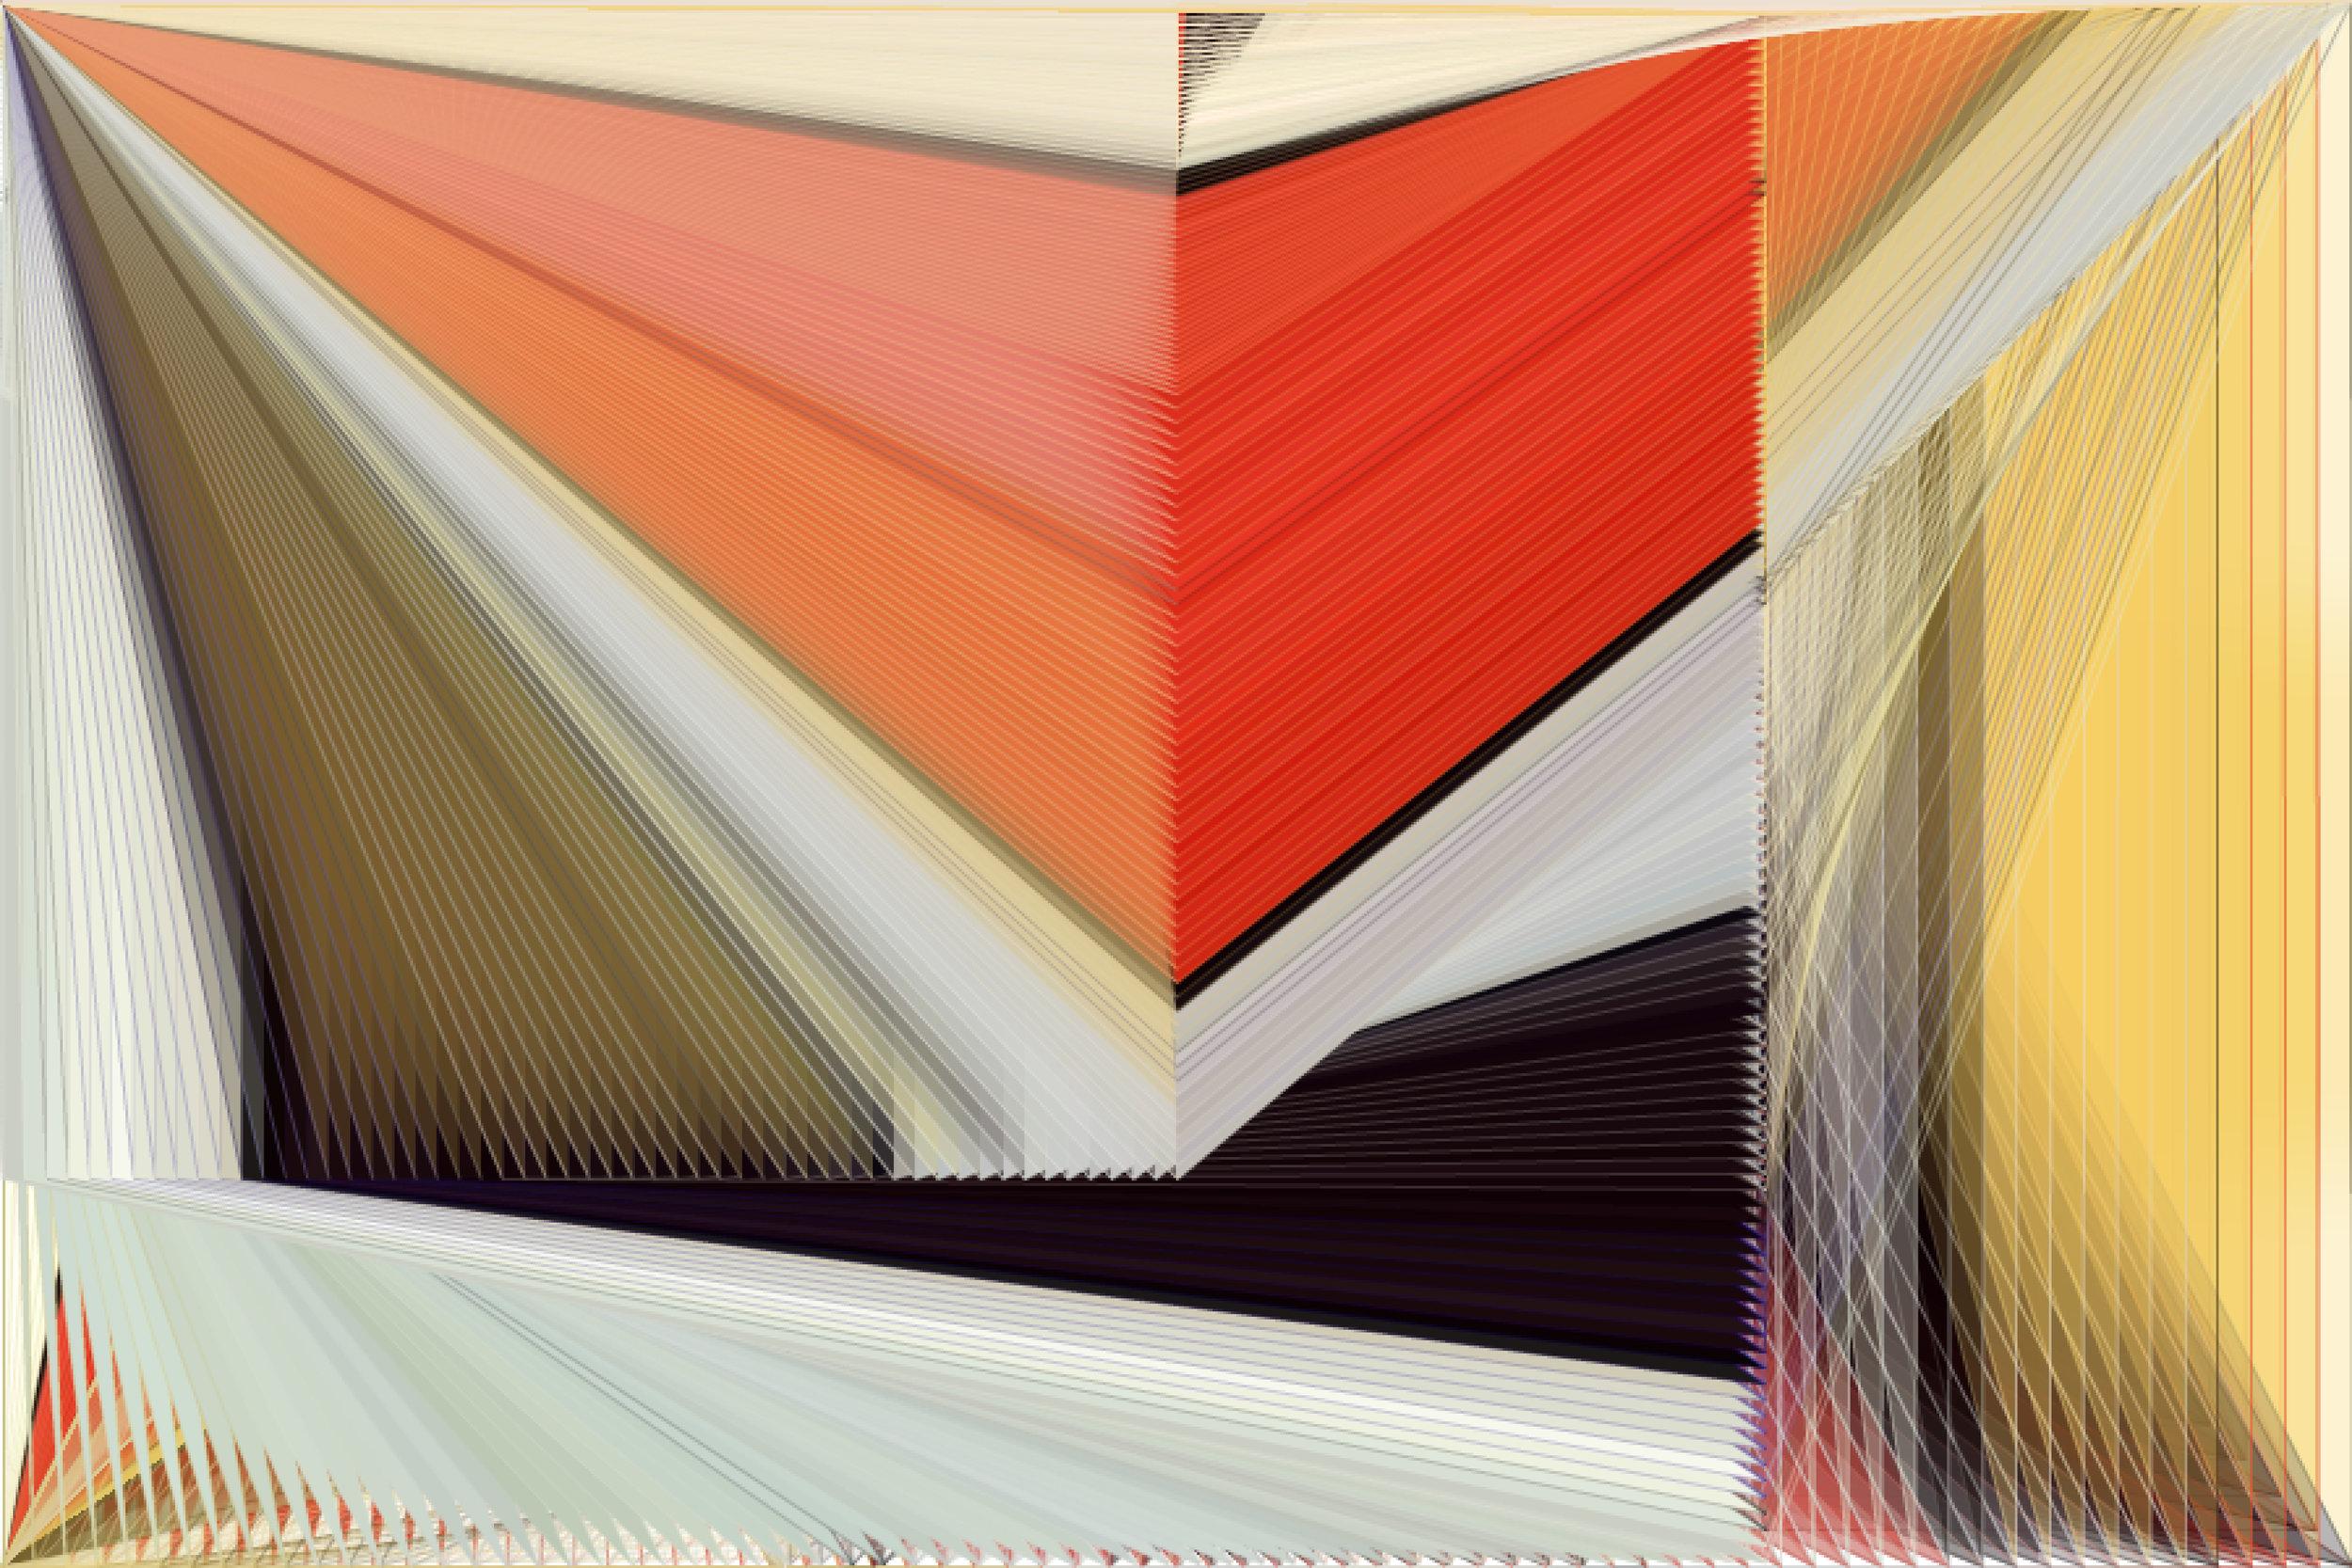 Mondrian Rearranged